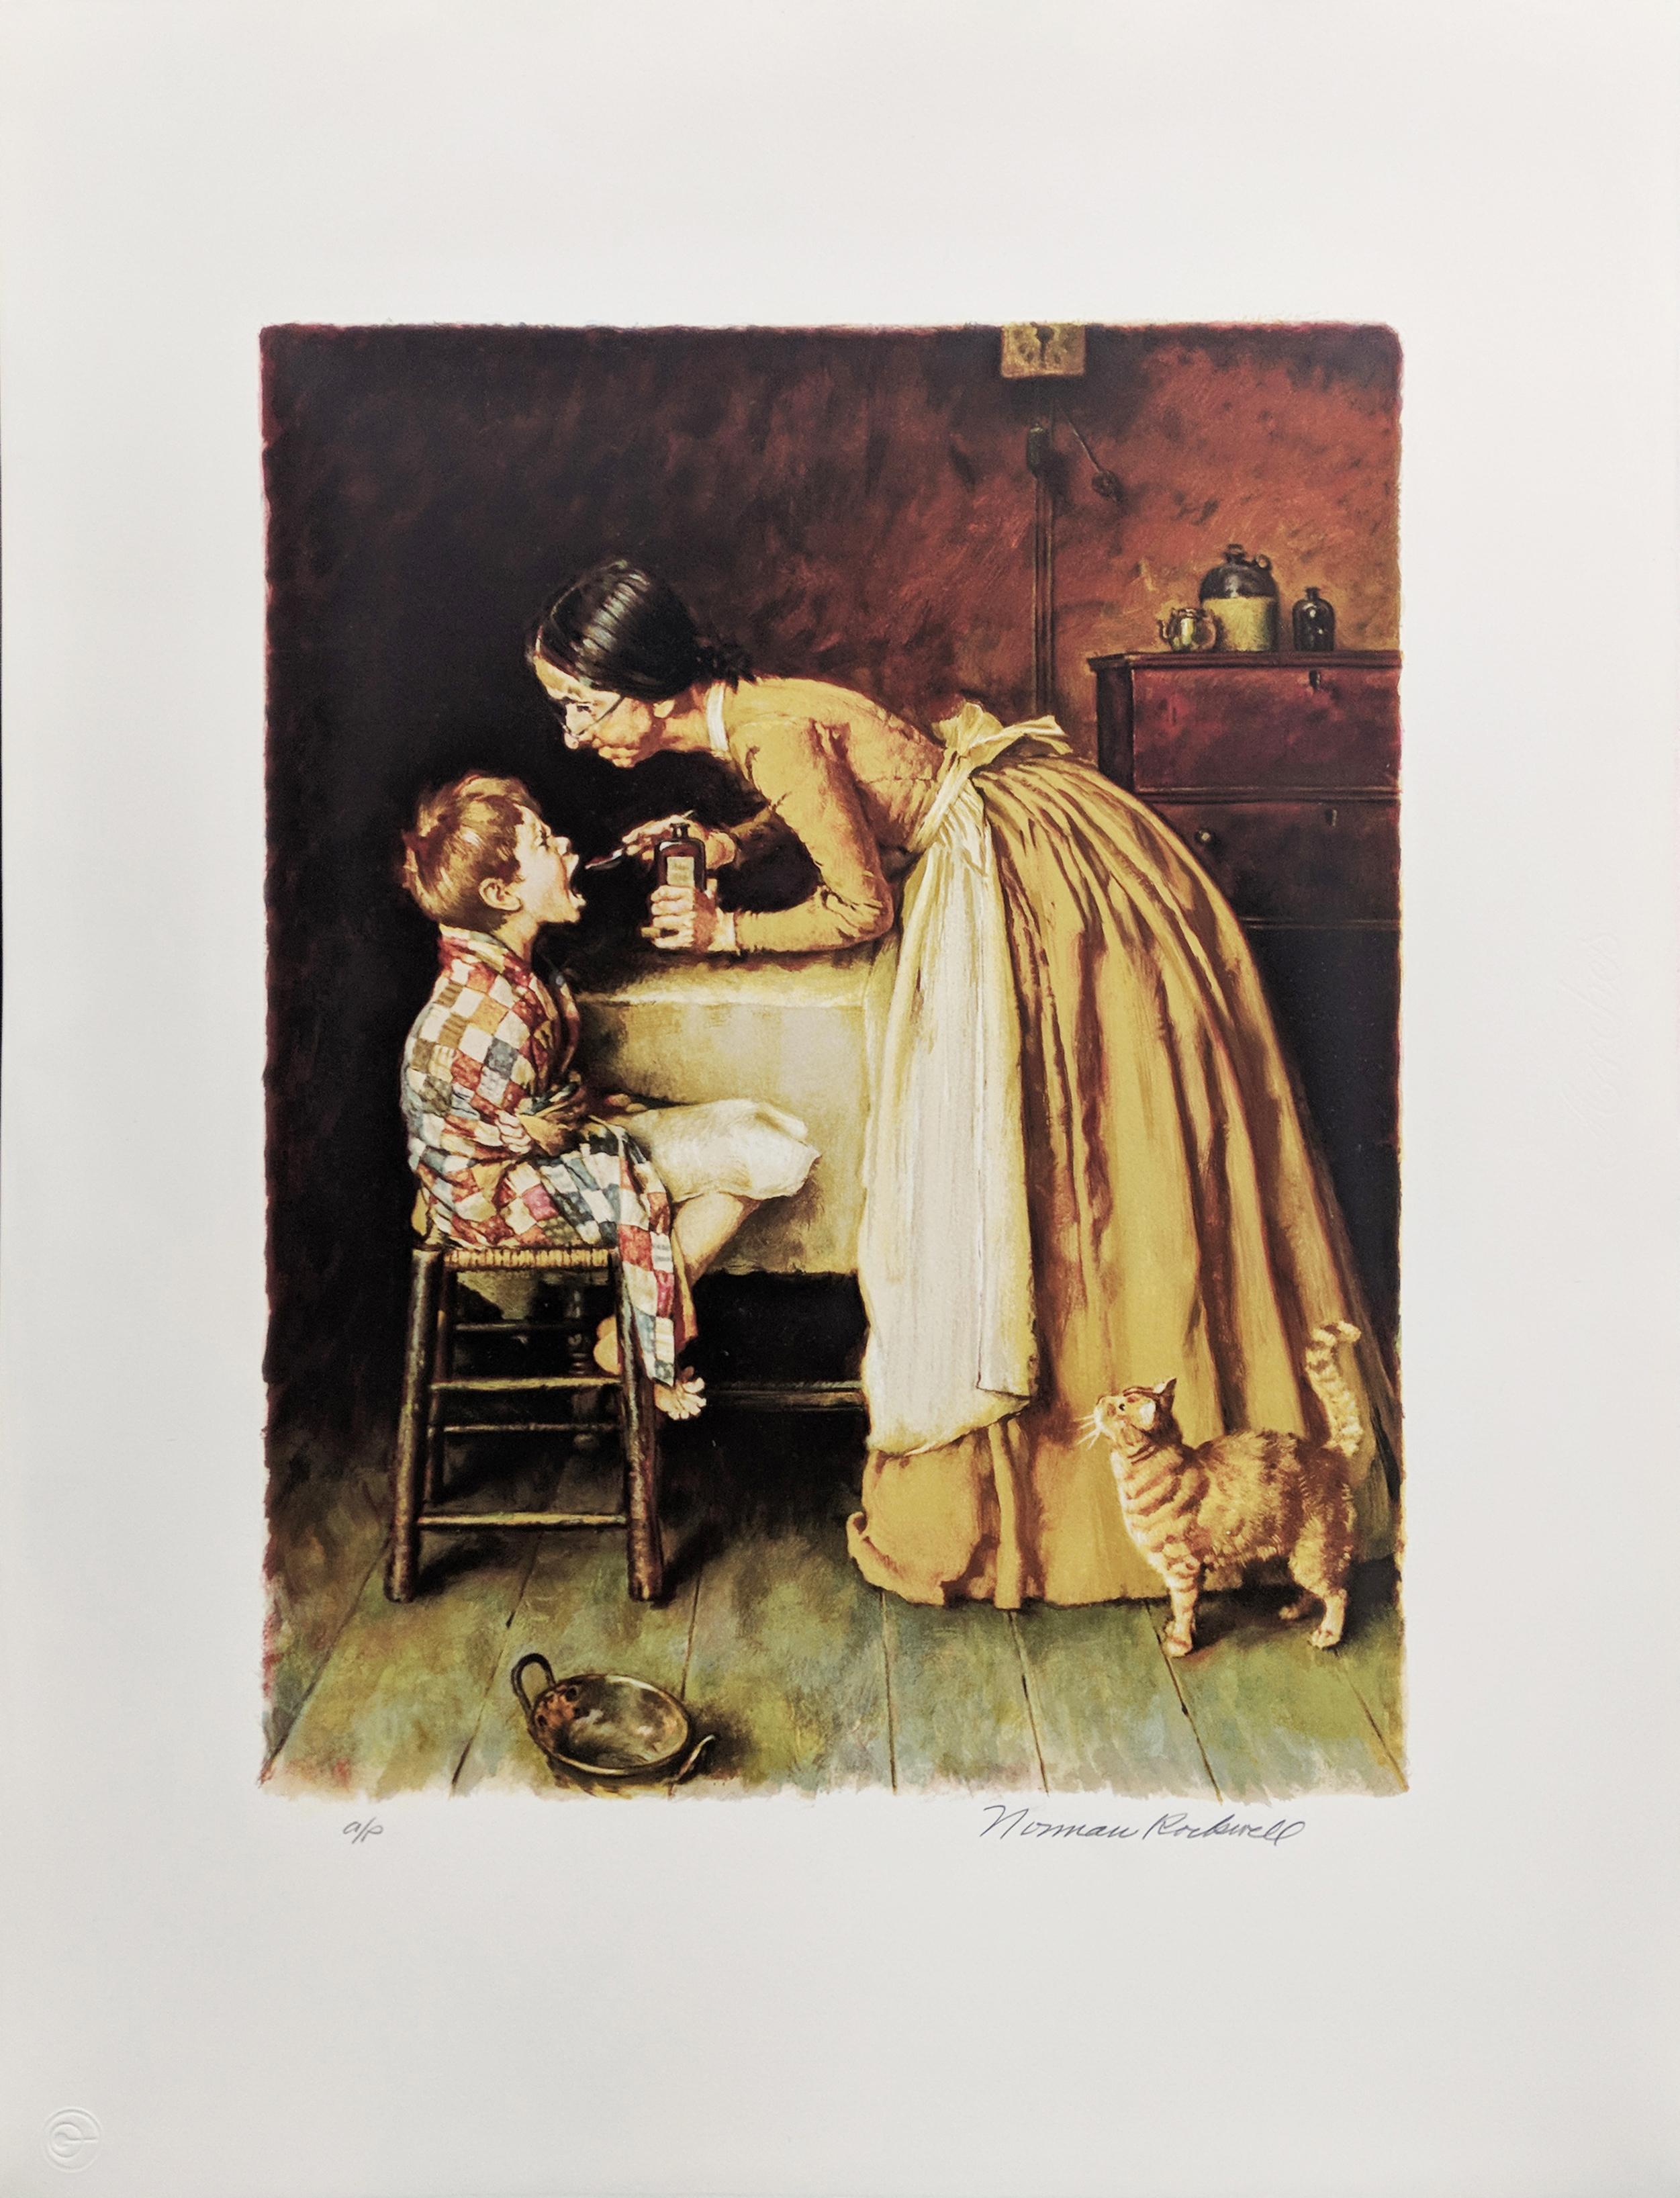 Norman Rockwell Medicine Tom Sawyer Portfolio Print